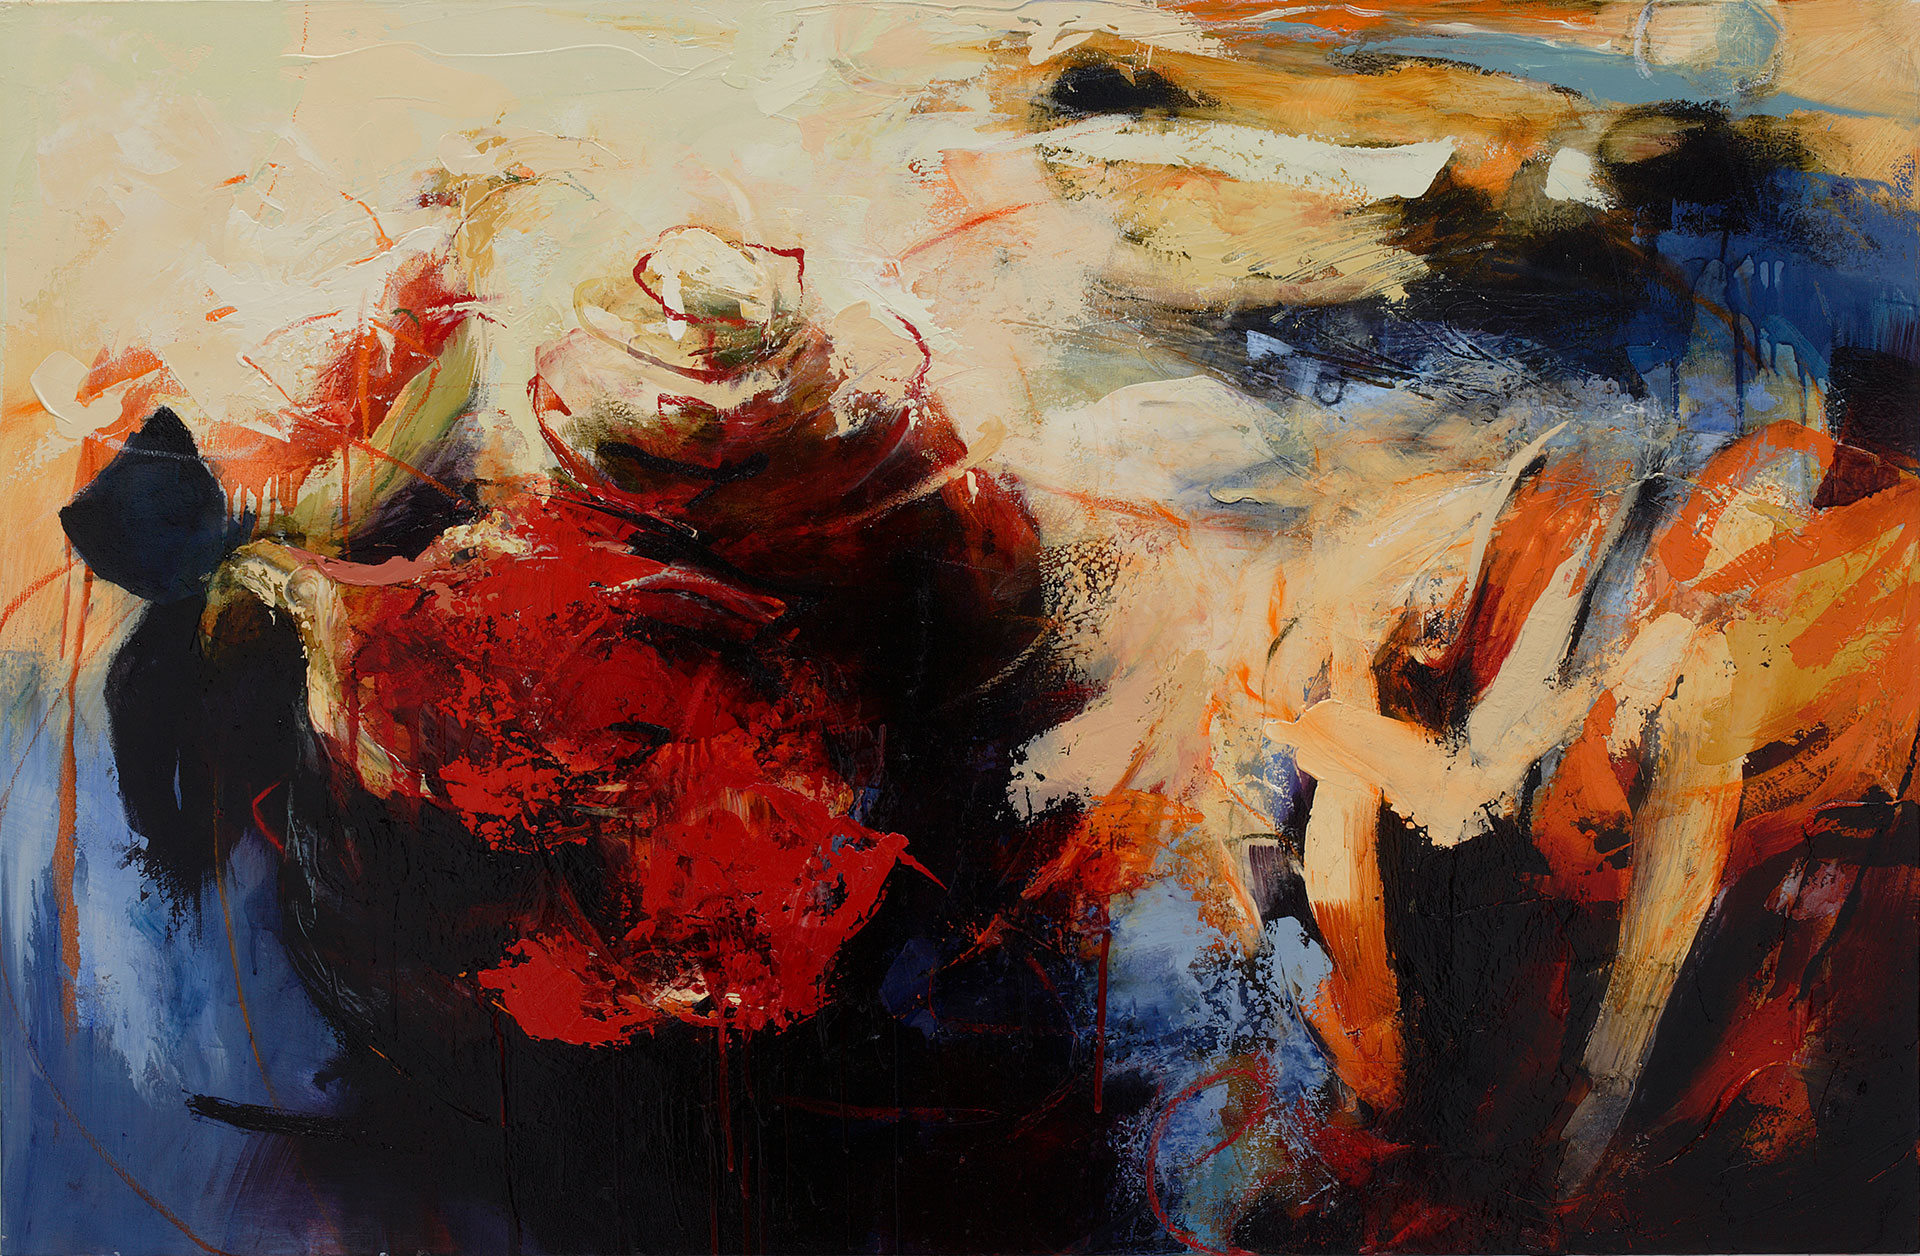 "Juicy, Oil, alkyd, wax on canvas, 34"" x 52"""